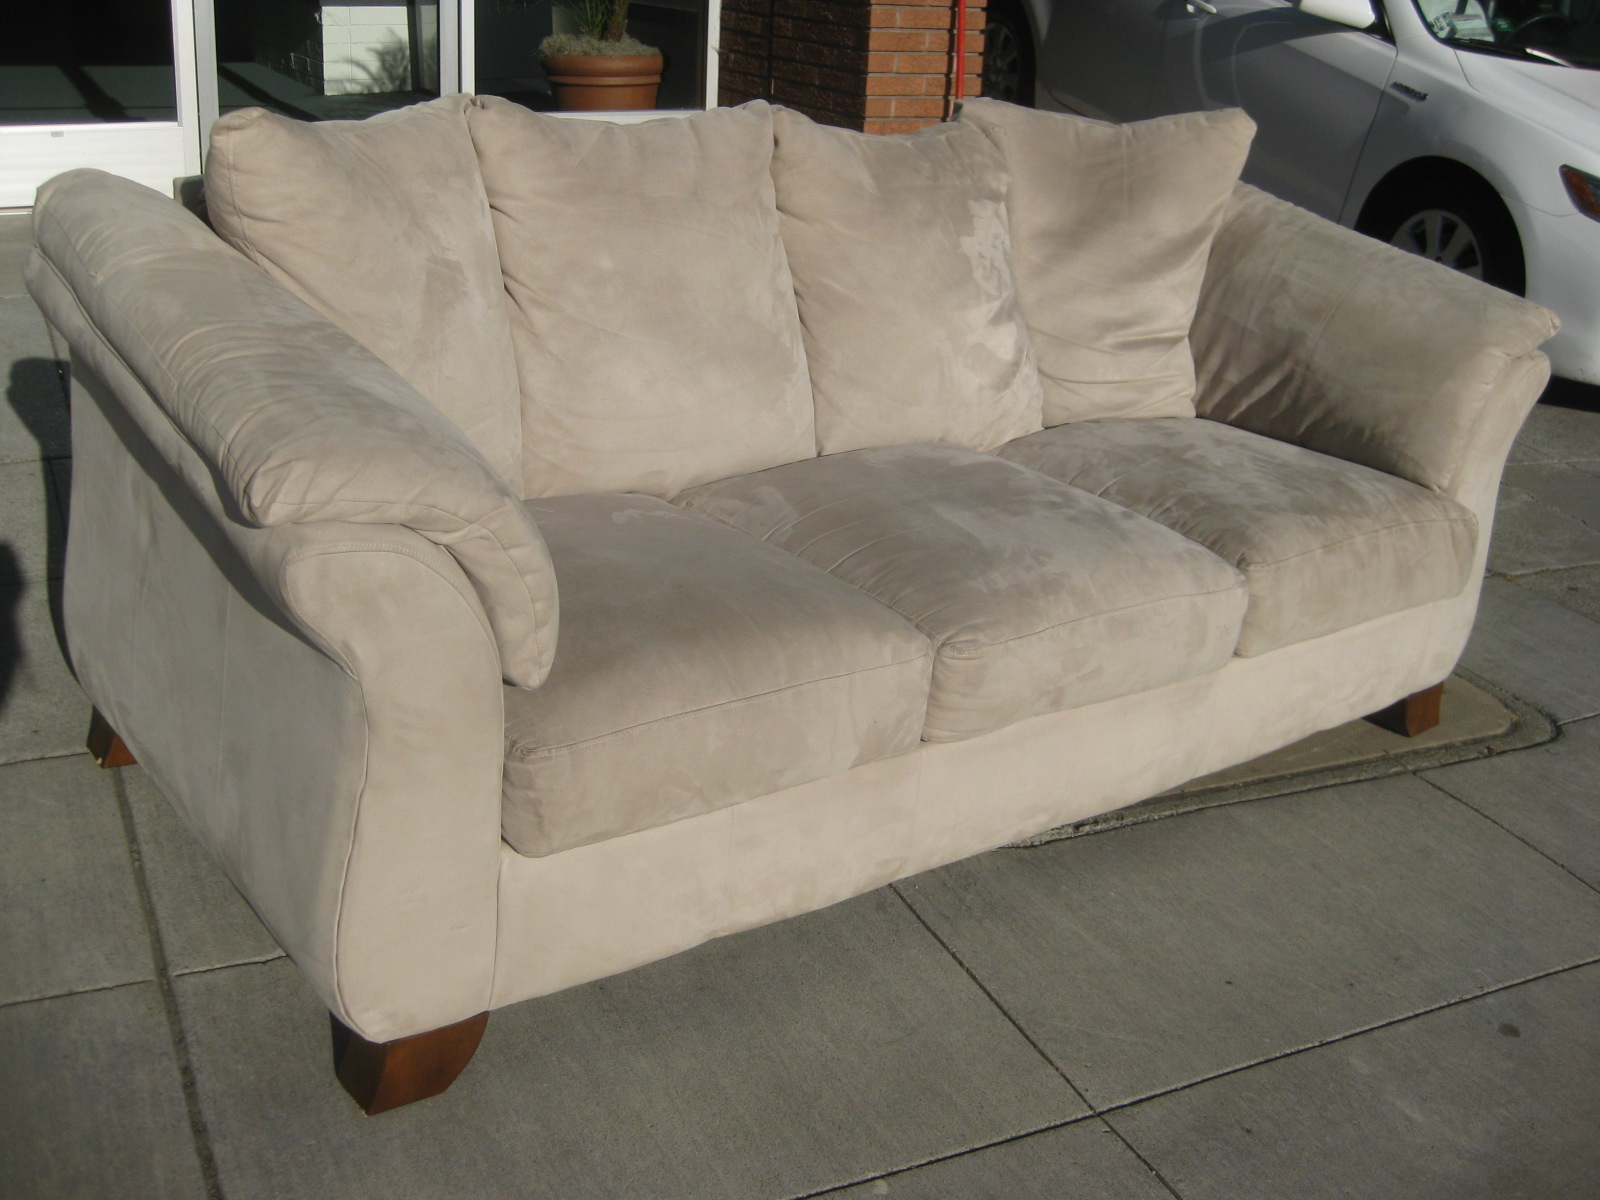 SOLD   Microsuede Sofa   $100